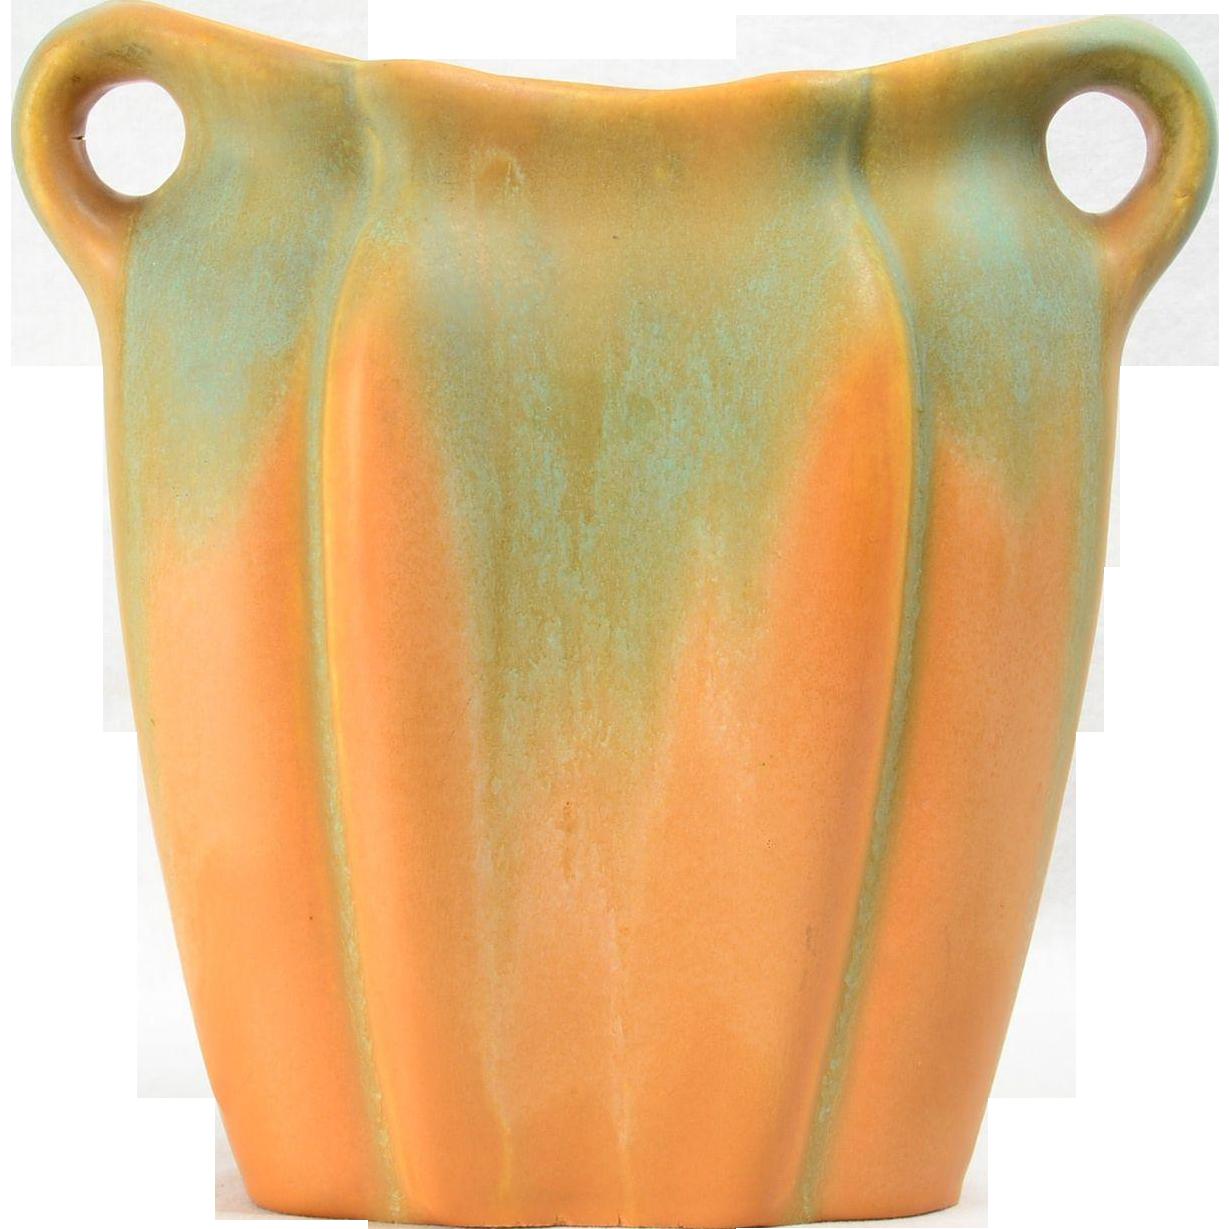 1930's Muncie Pottery Green drip over Pumpkin Vase with Handles Shape 192-9 MUNCIE 2A